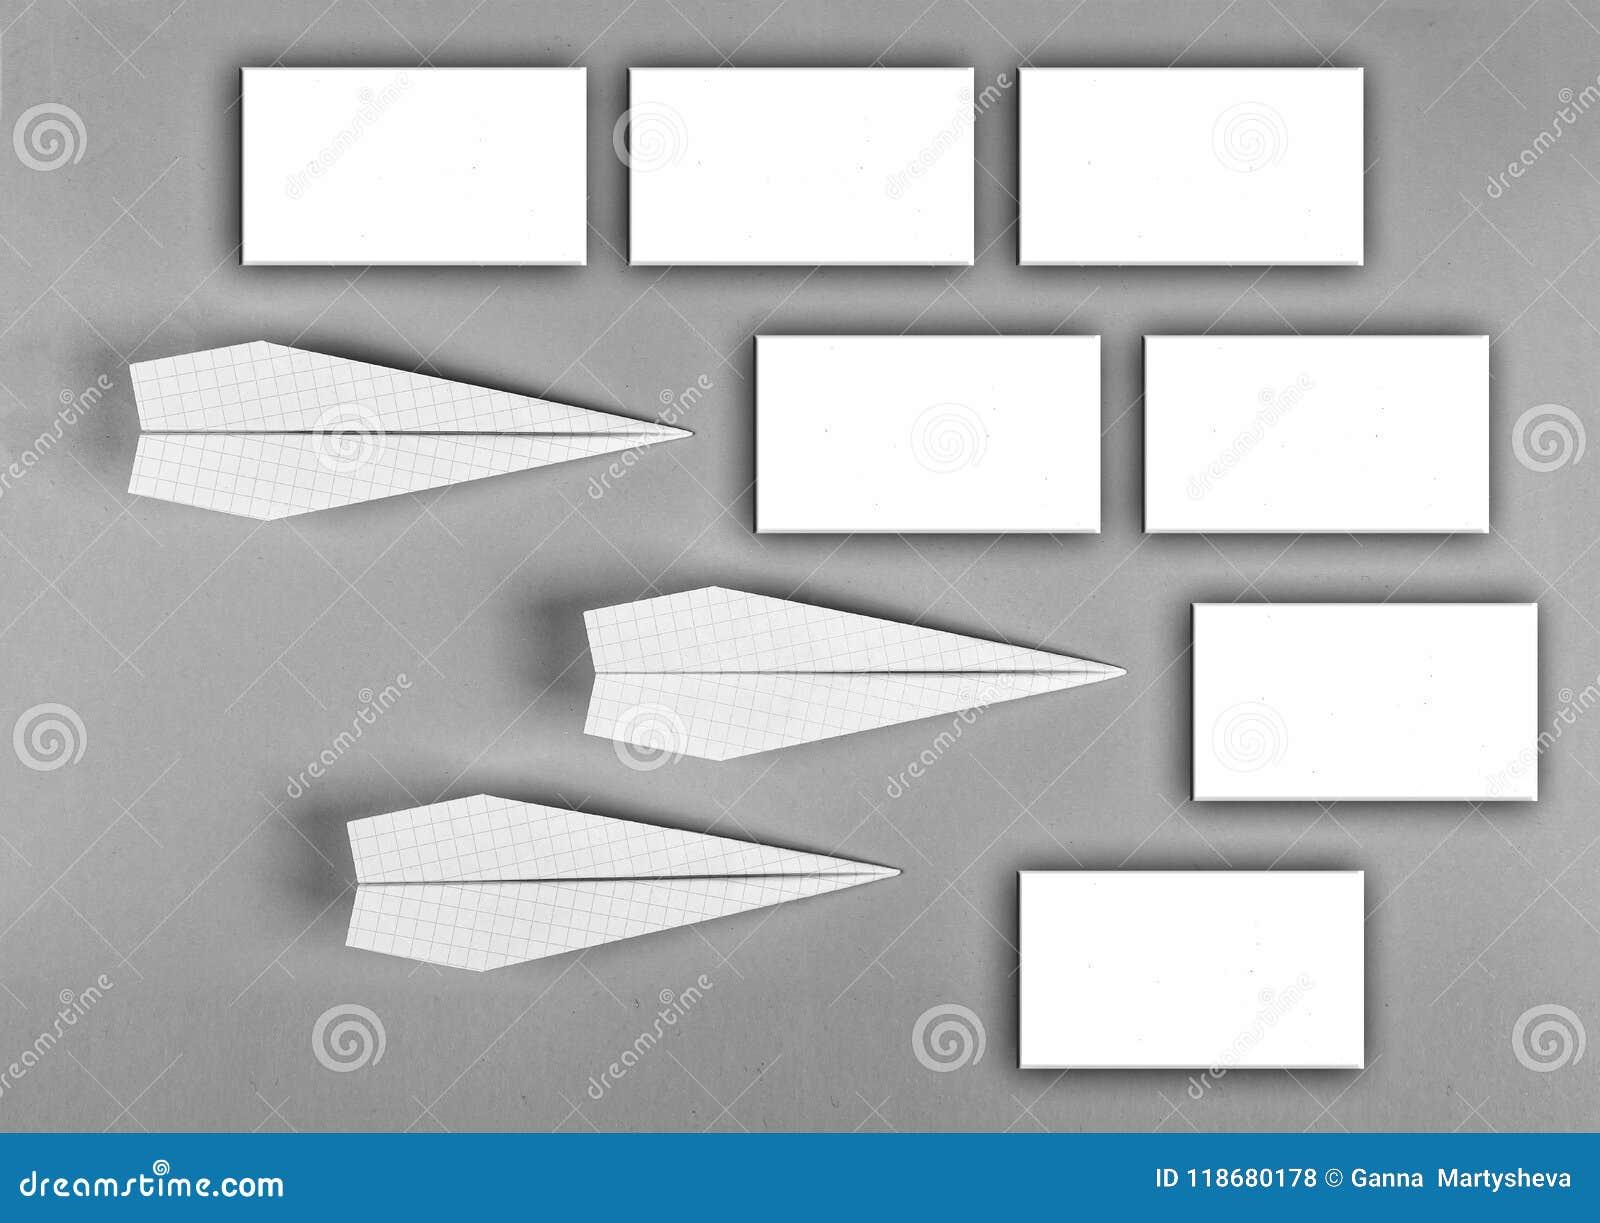 black and white minimalism airplane school sheet school schedule